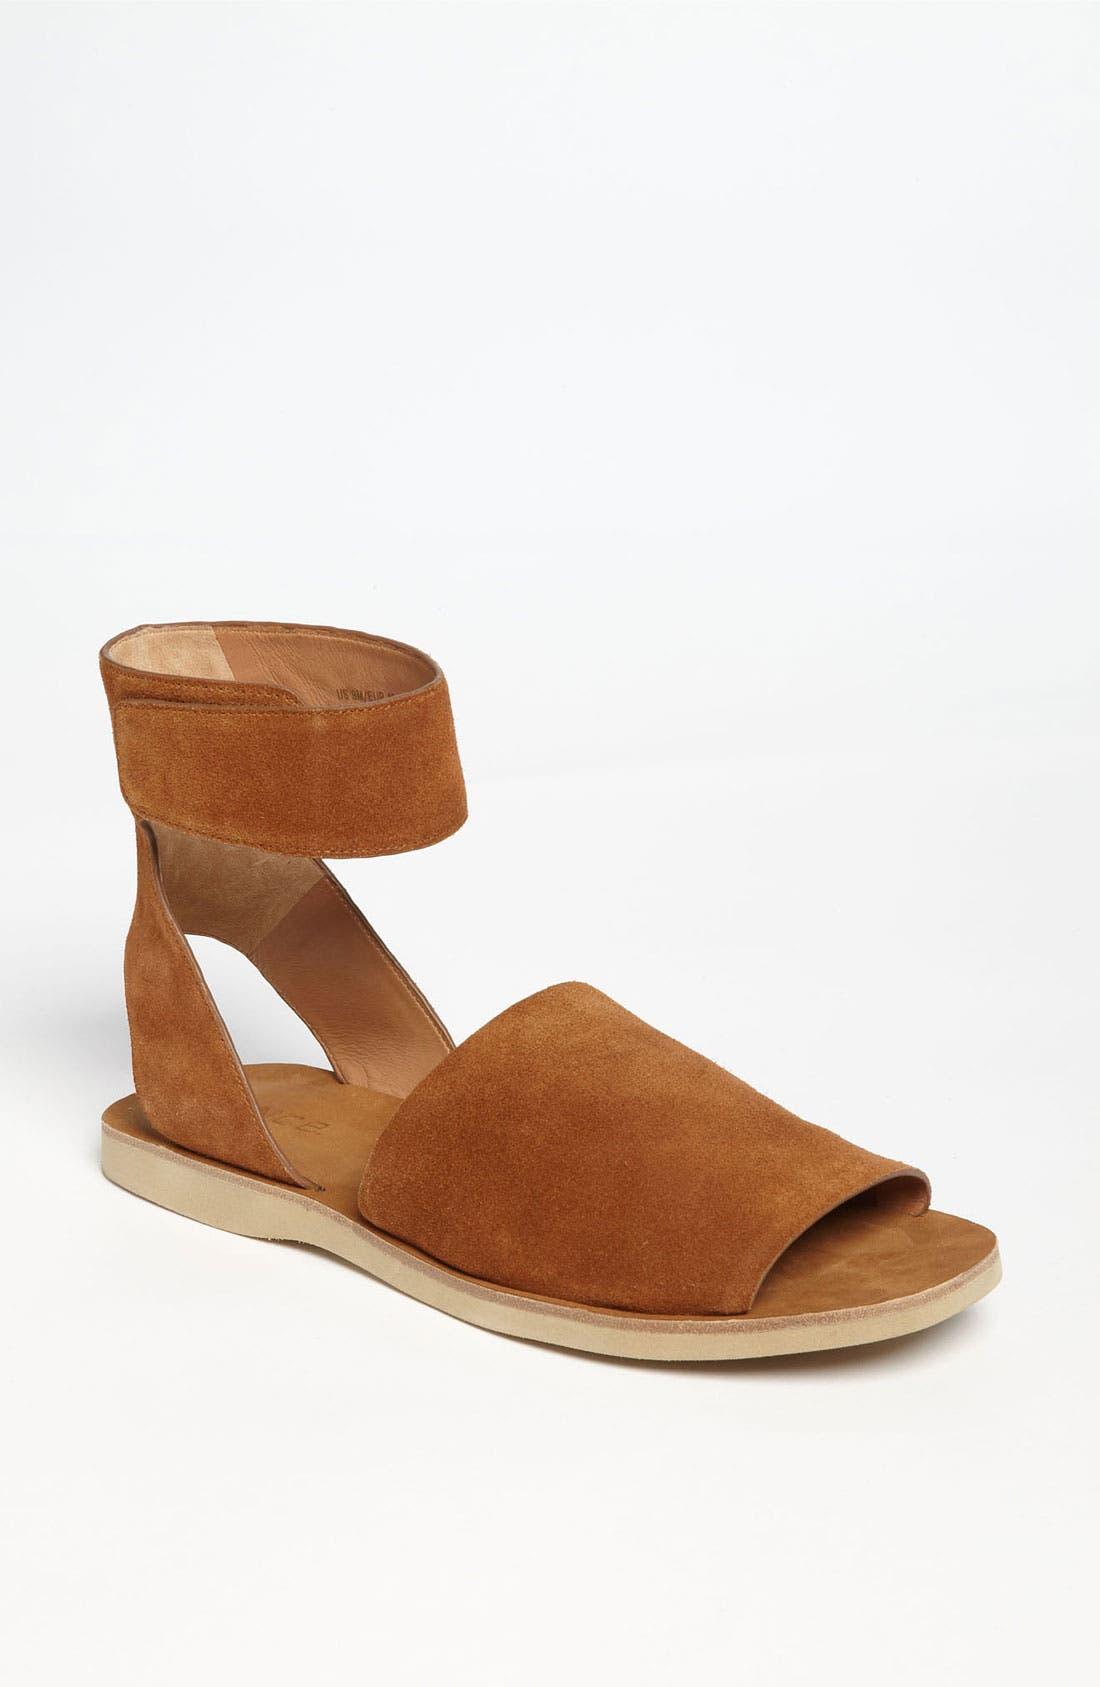 Main Image - Vince 'Sadie' Sandal